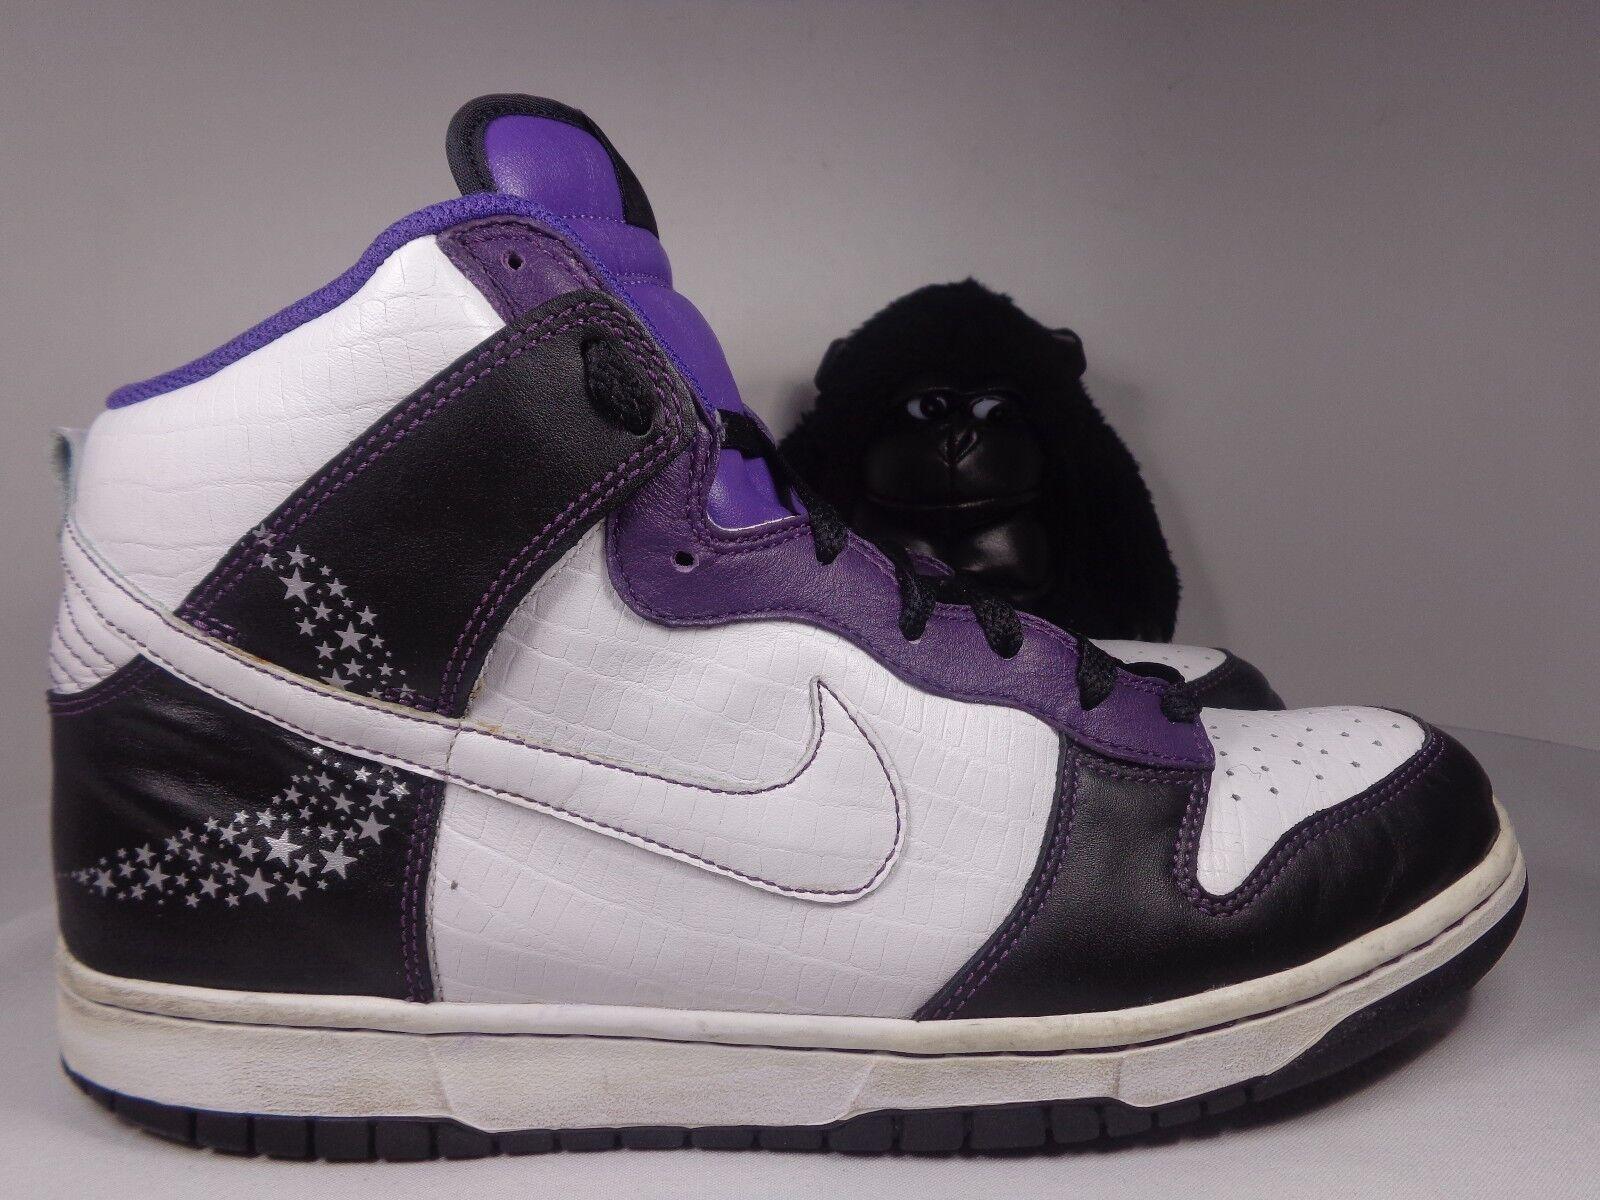 Uomo Nike Dunk High Premium Crocodile Basketball shoes size 11 US 312786-011